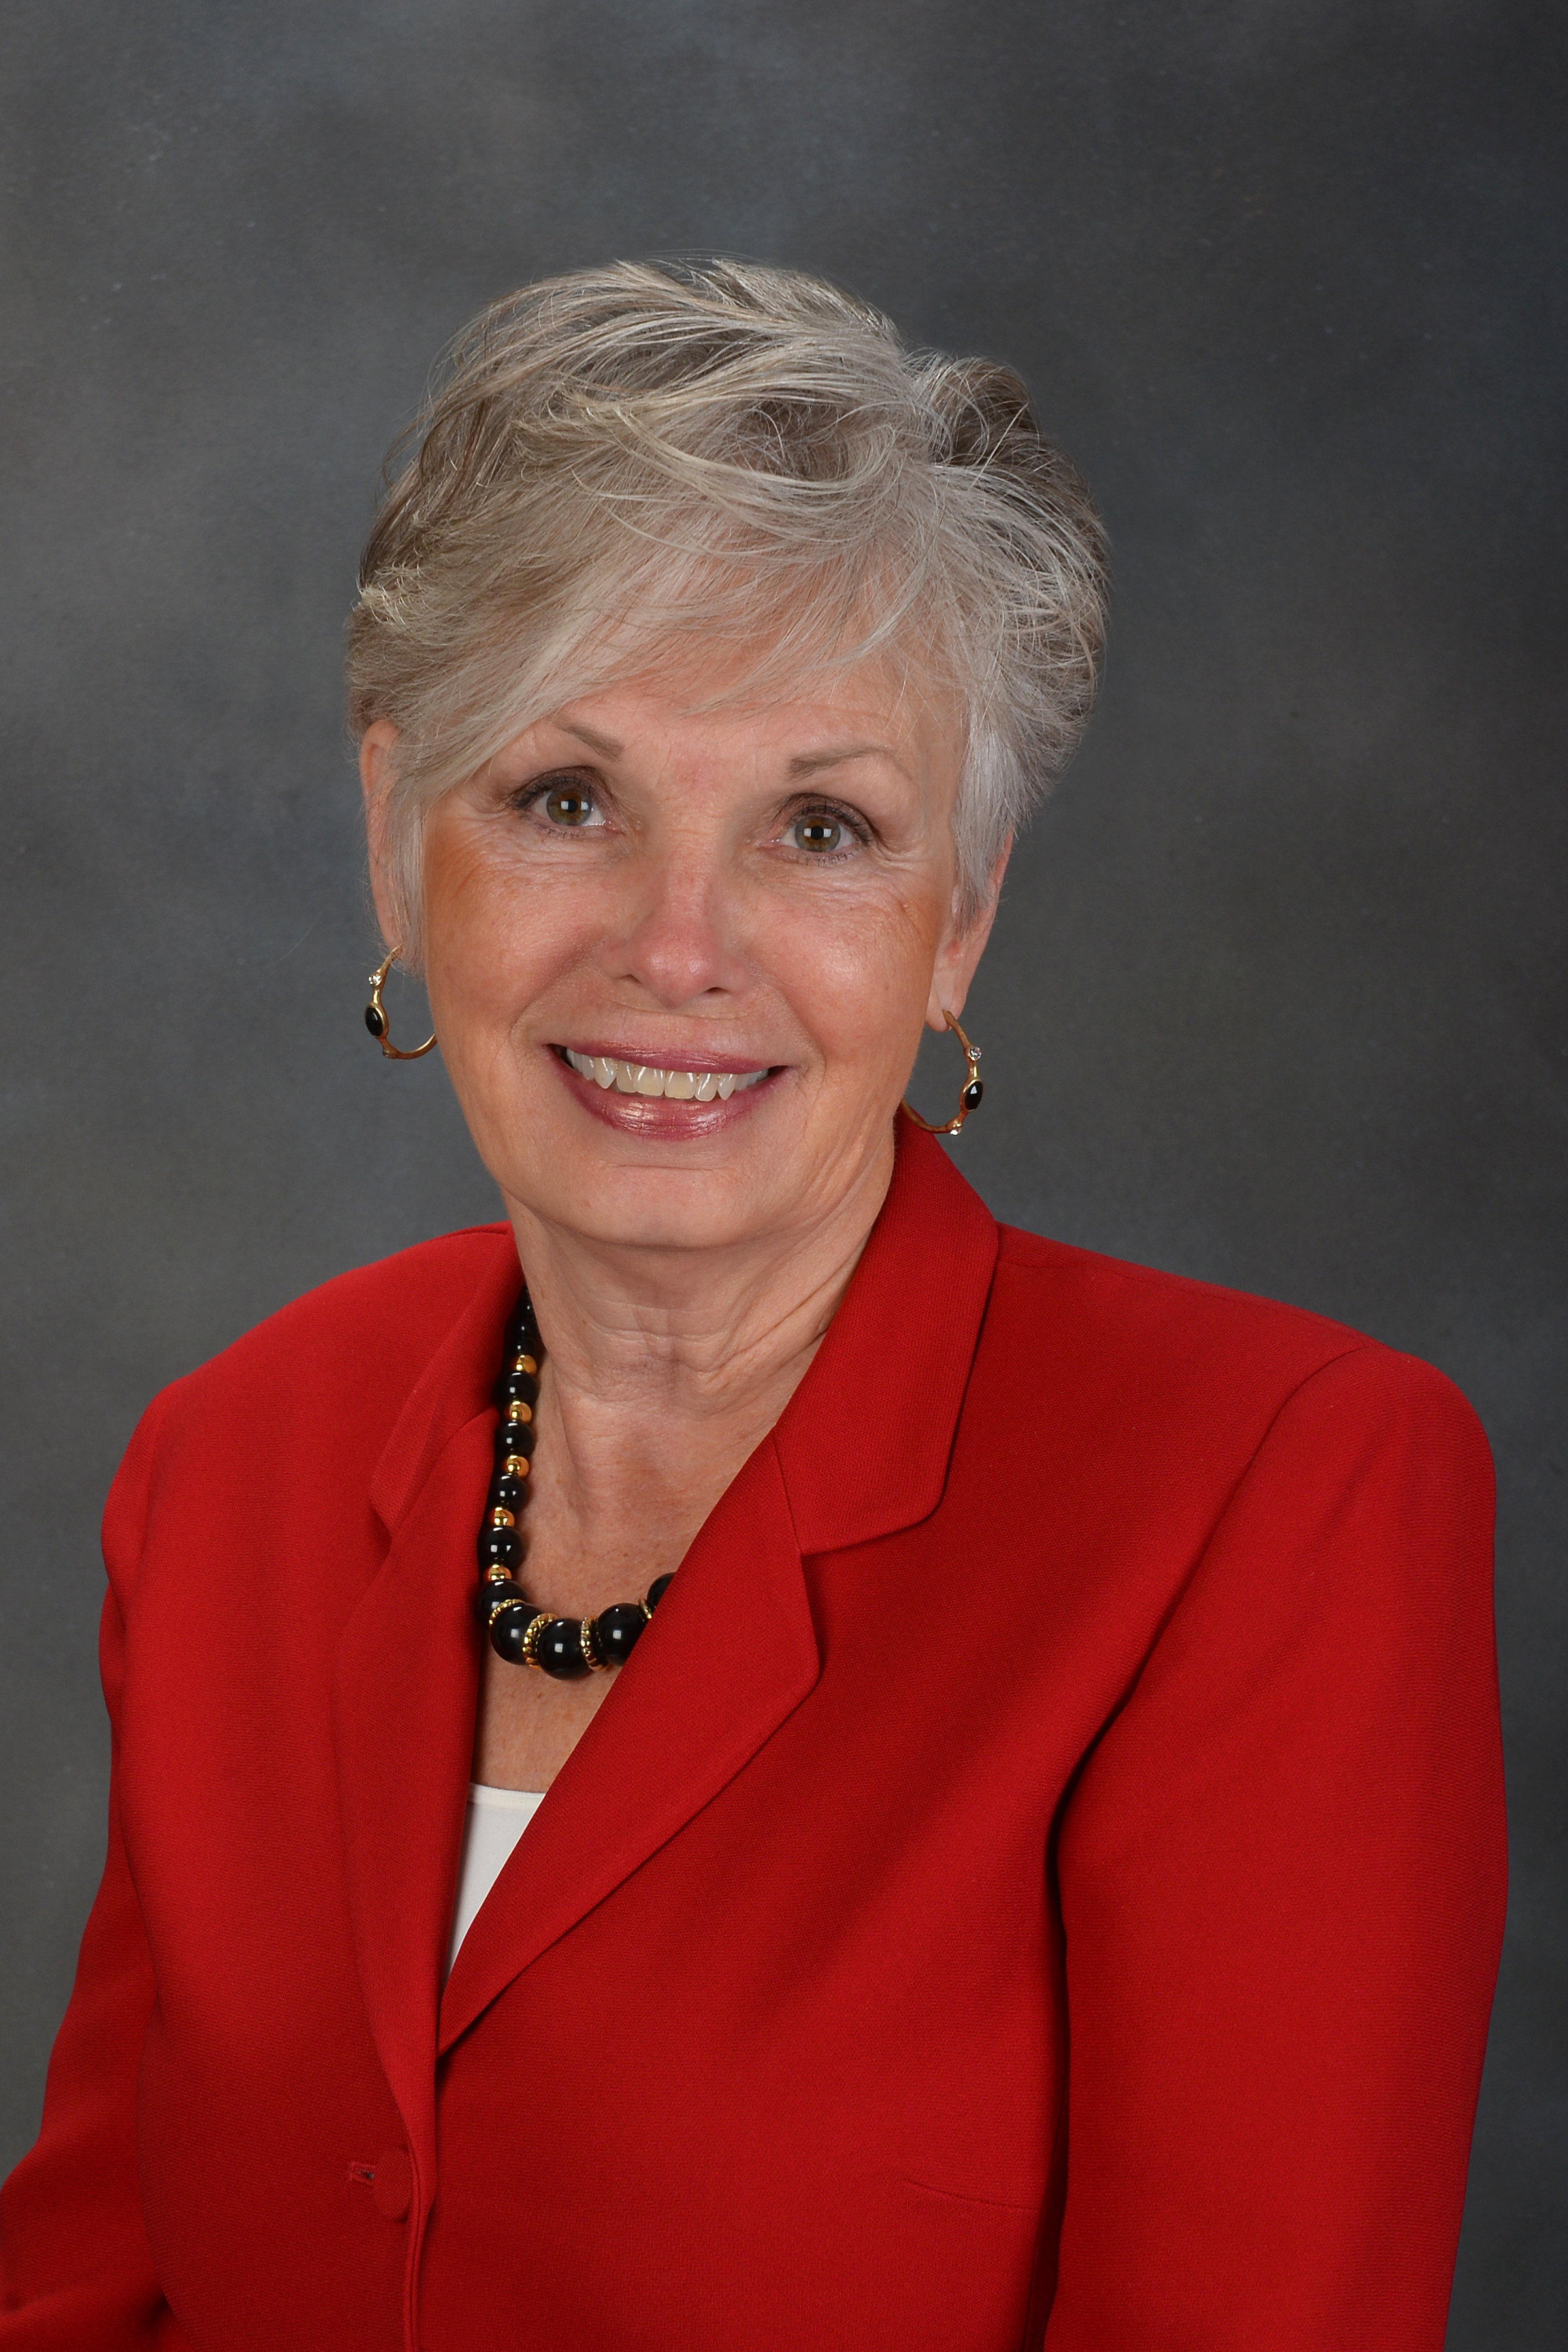 Dr. Pat Van Slyke